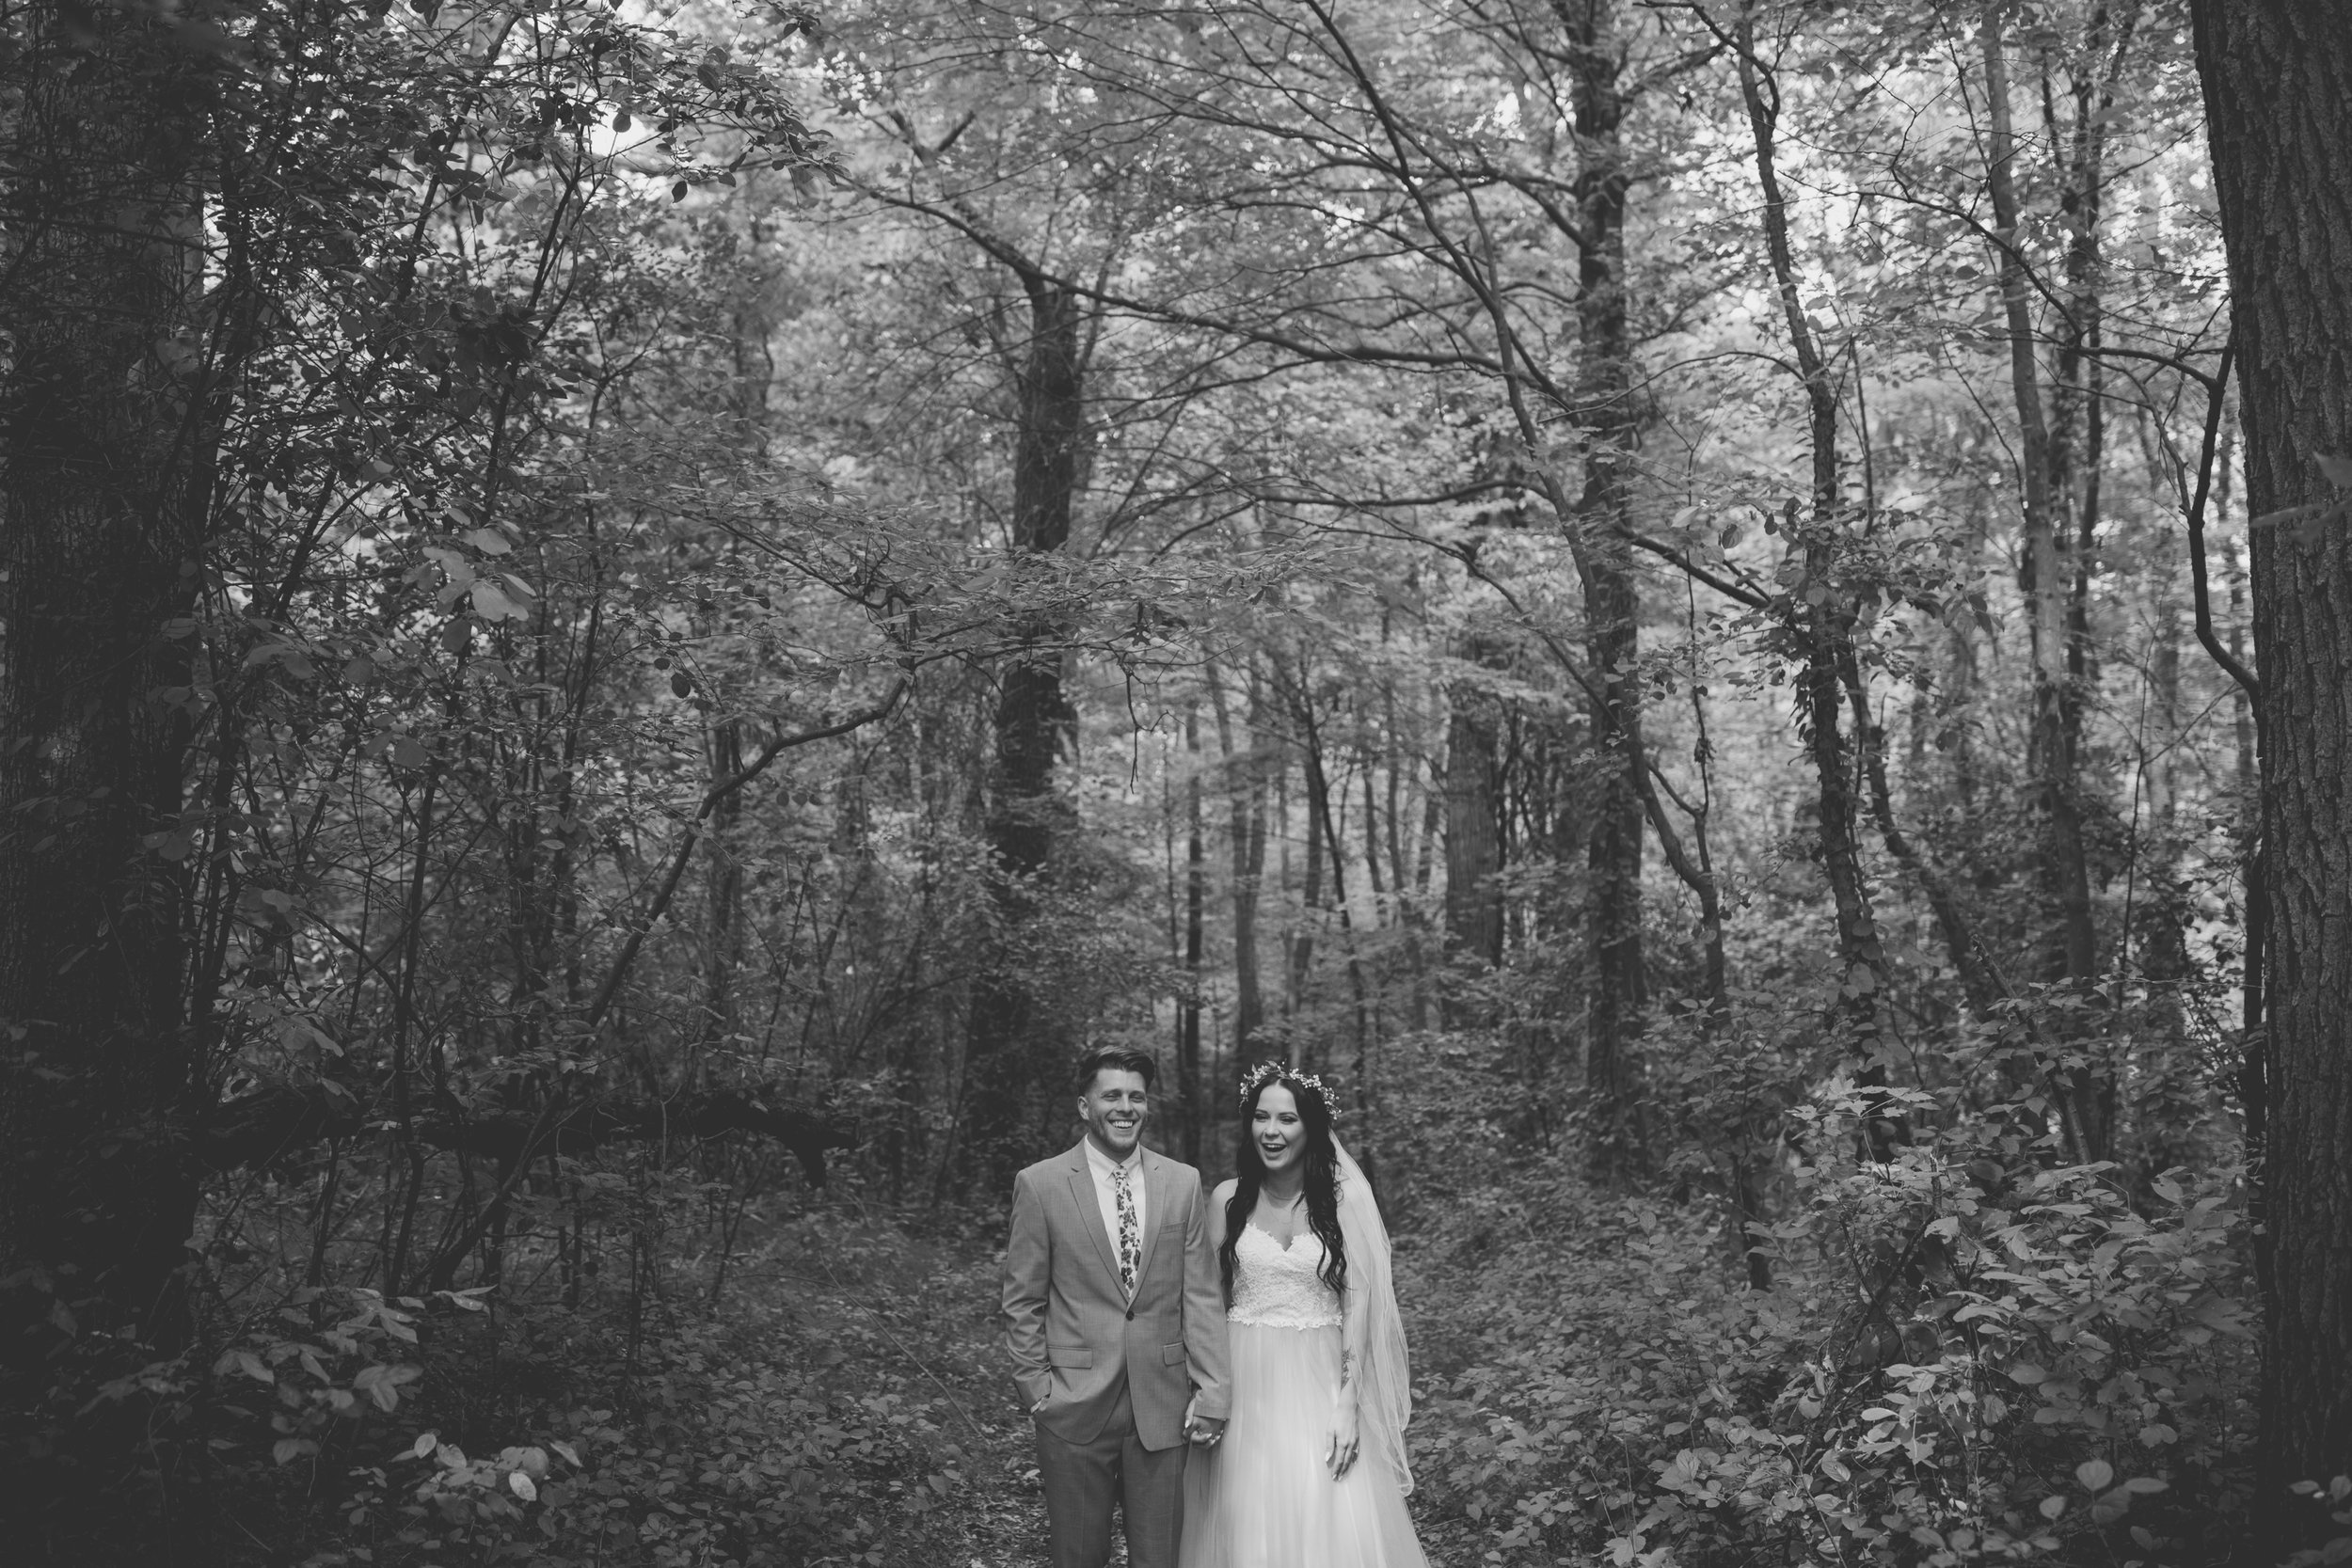 amanda_vanvels_michigan_camp_wedding_030.jpg